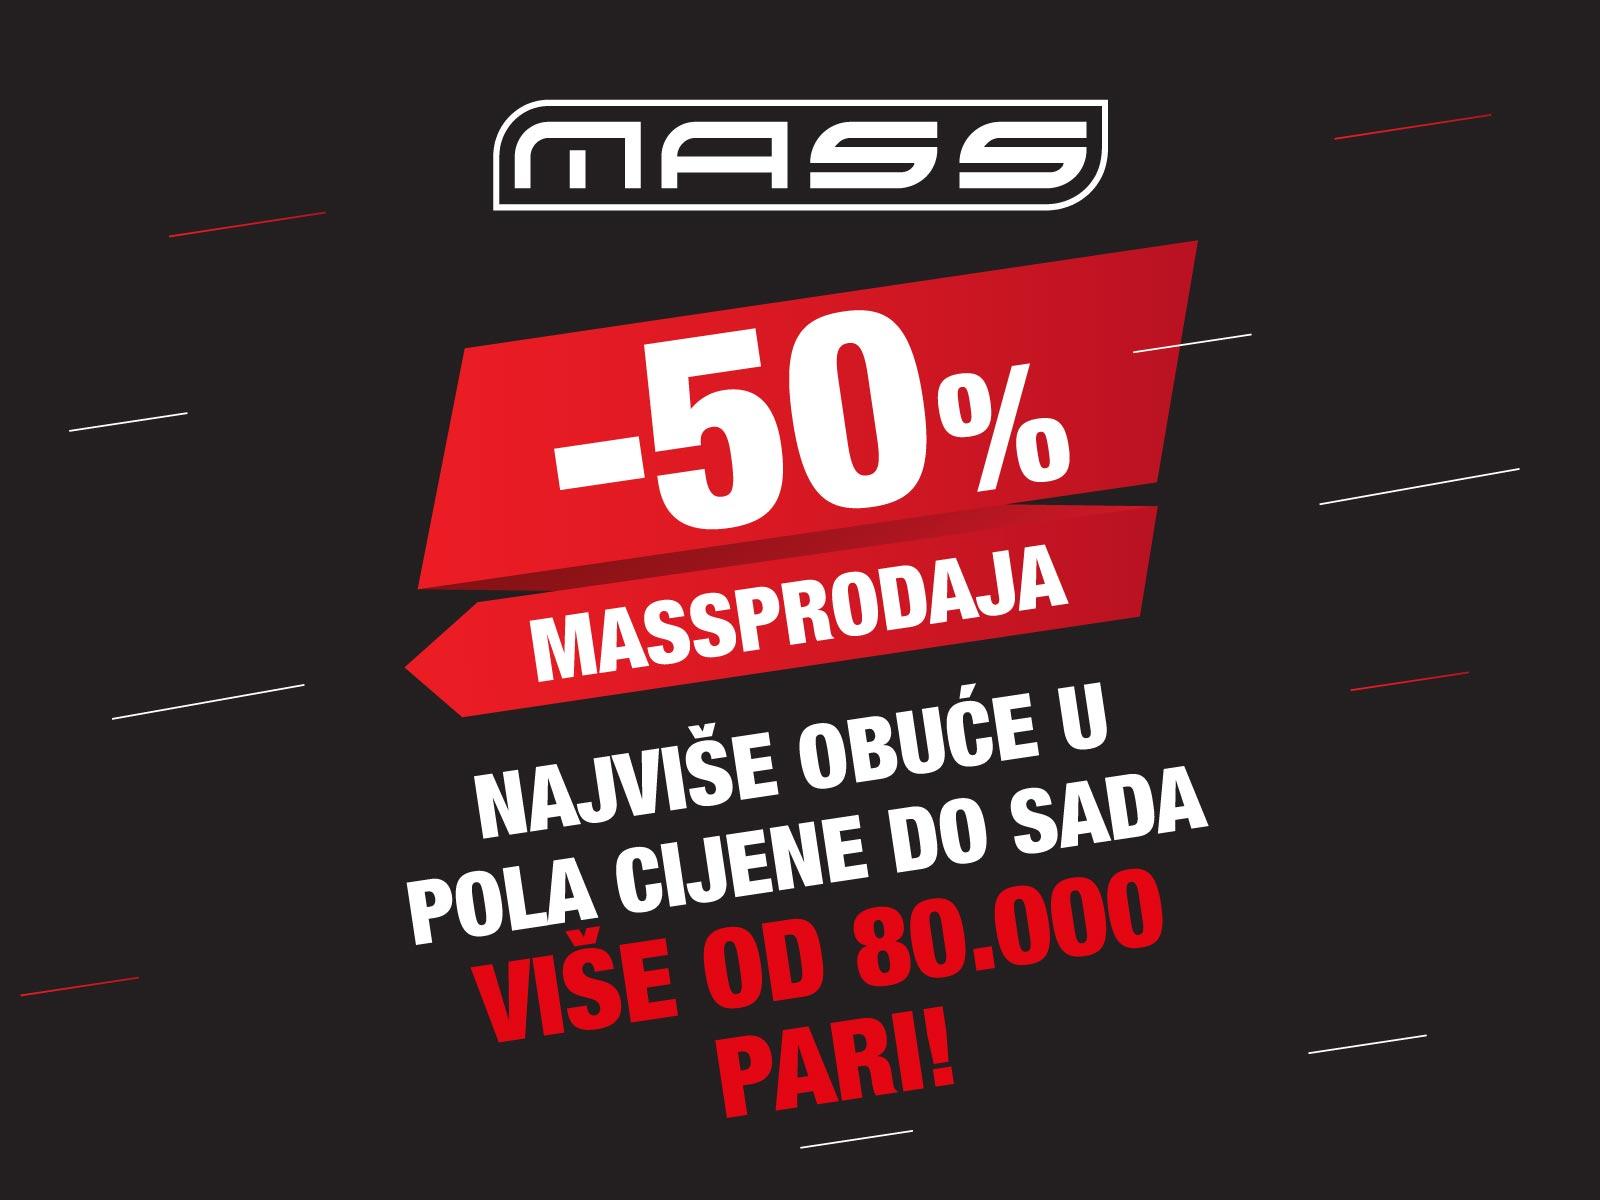 banner_MASSPRODAJA_-50%_CRO_1600x1200px